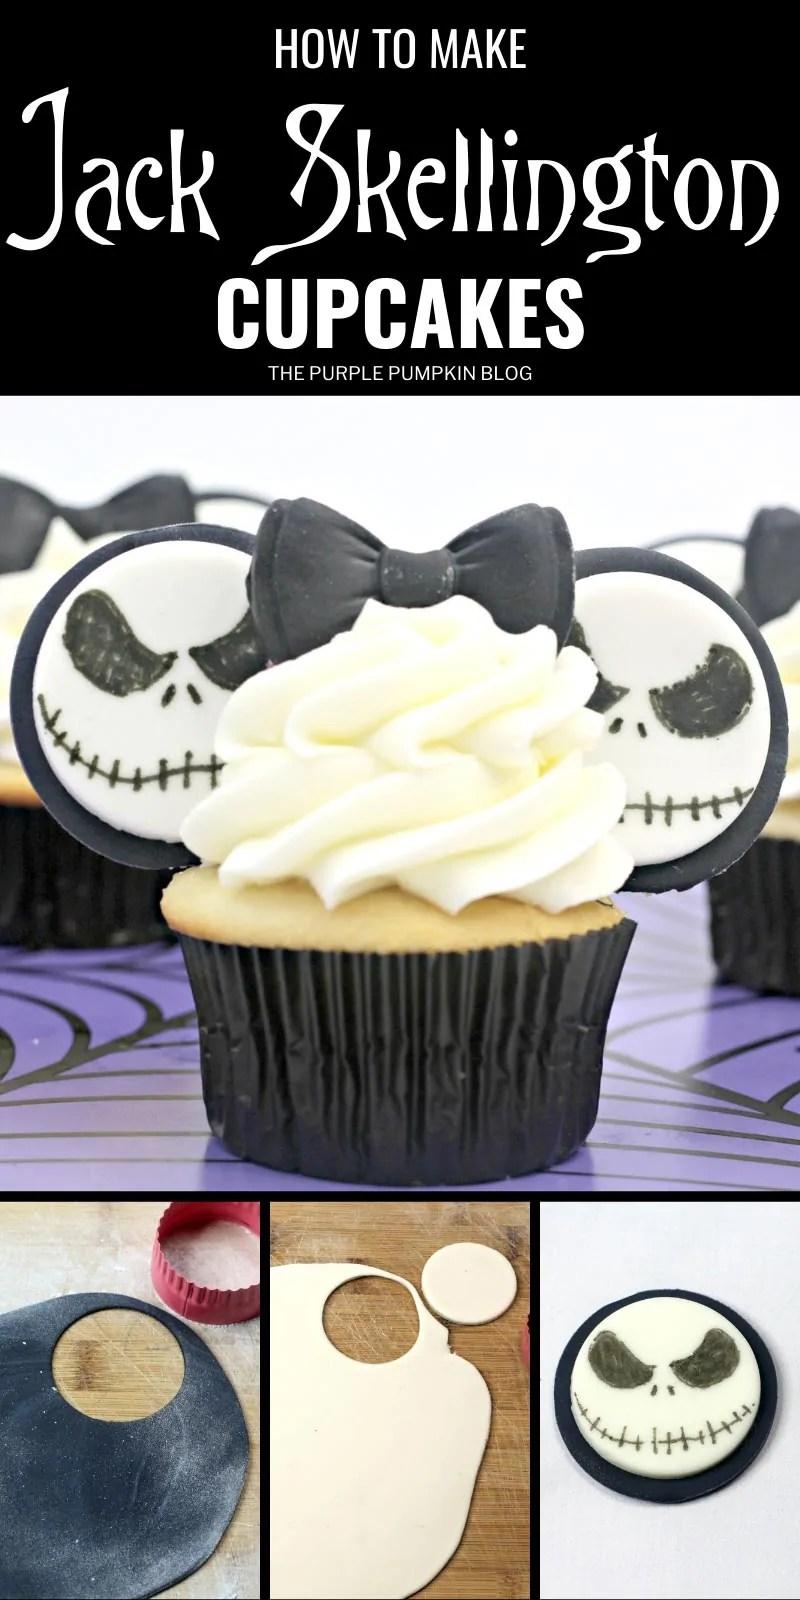 How to make Jack Skellington Cupcakes